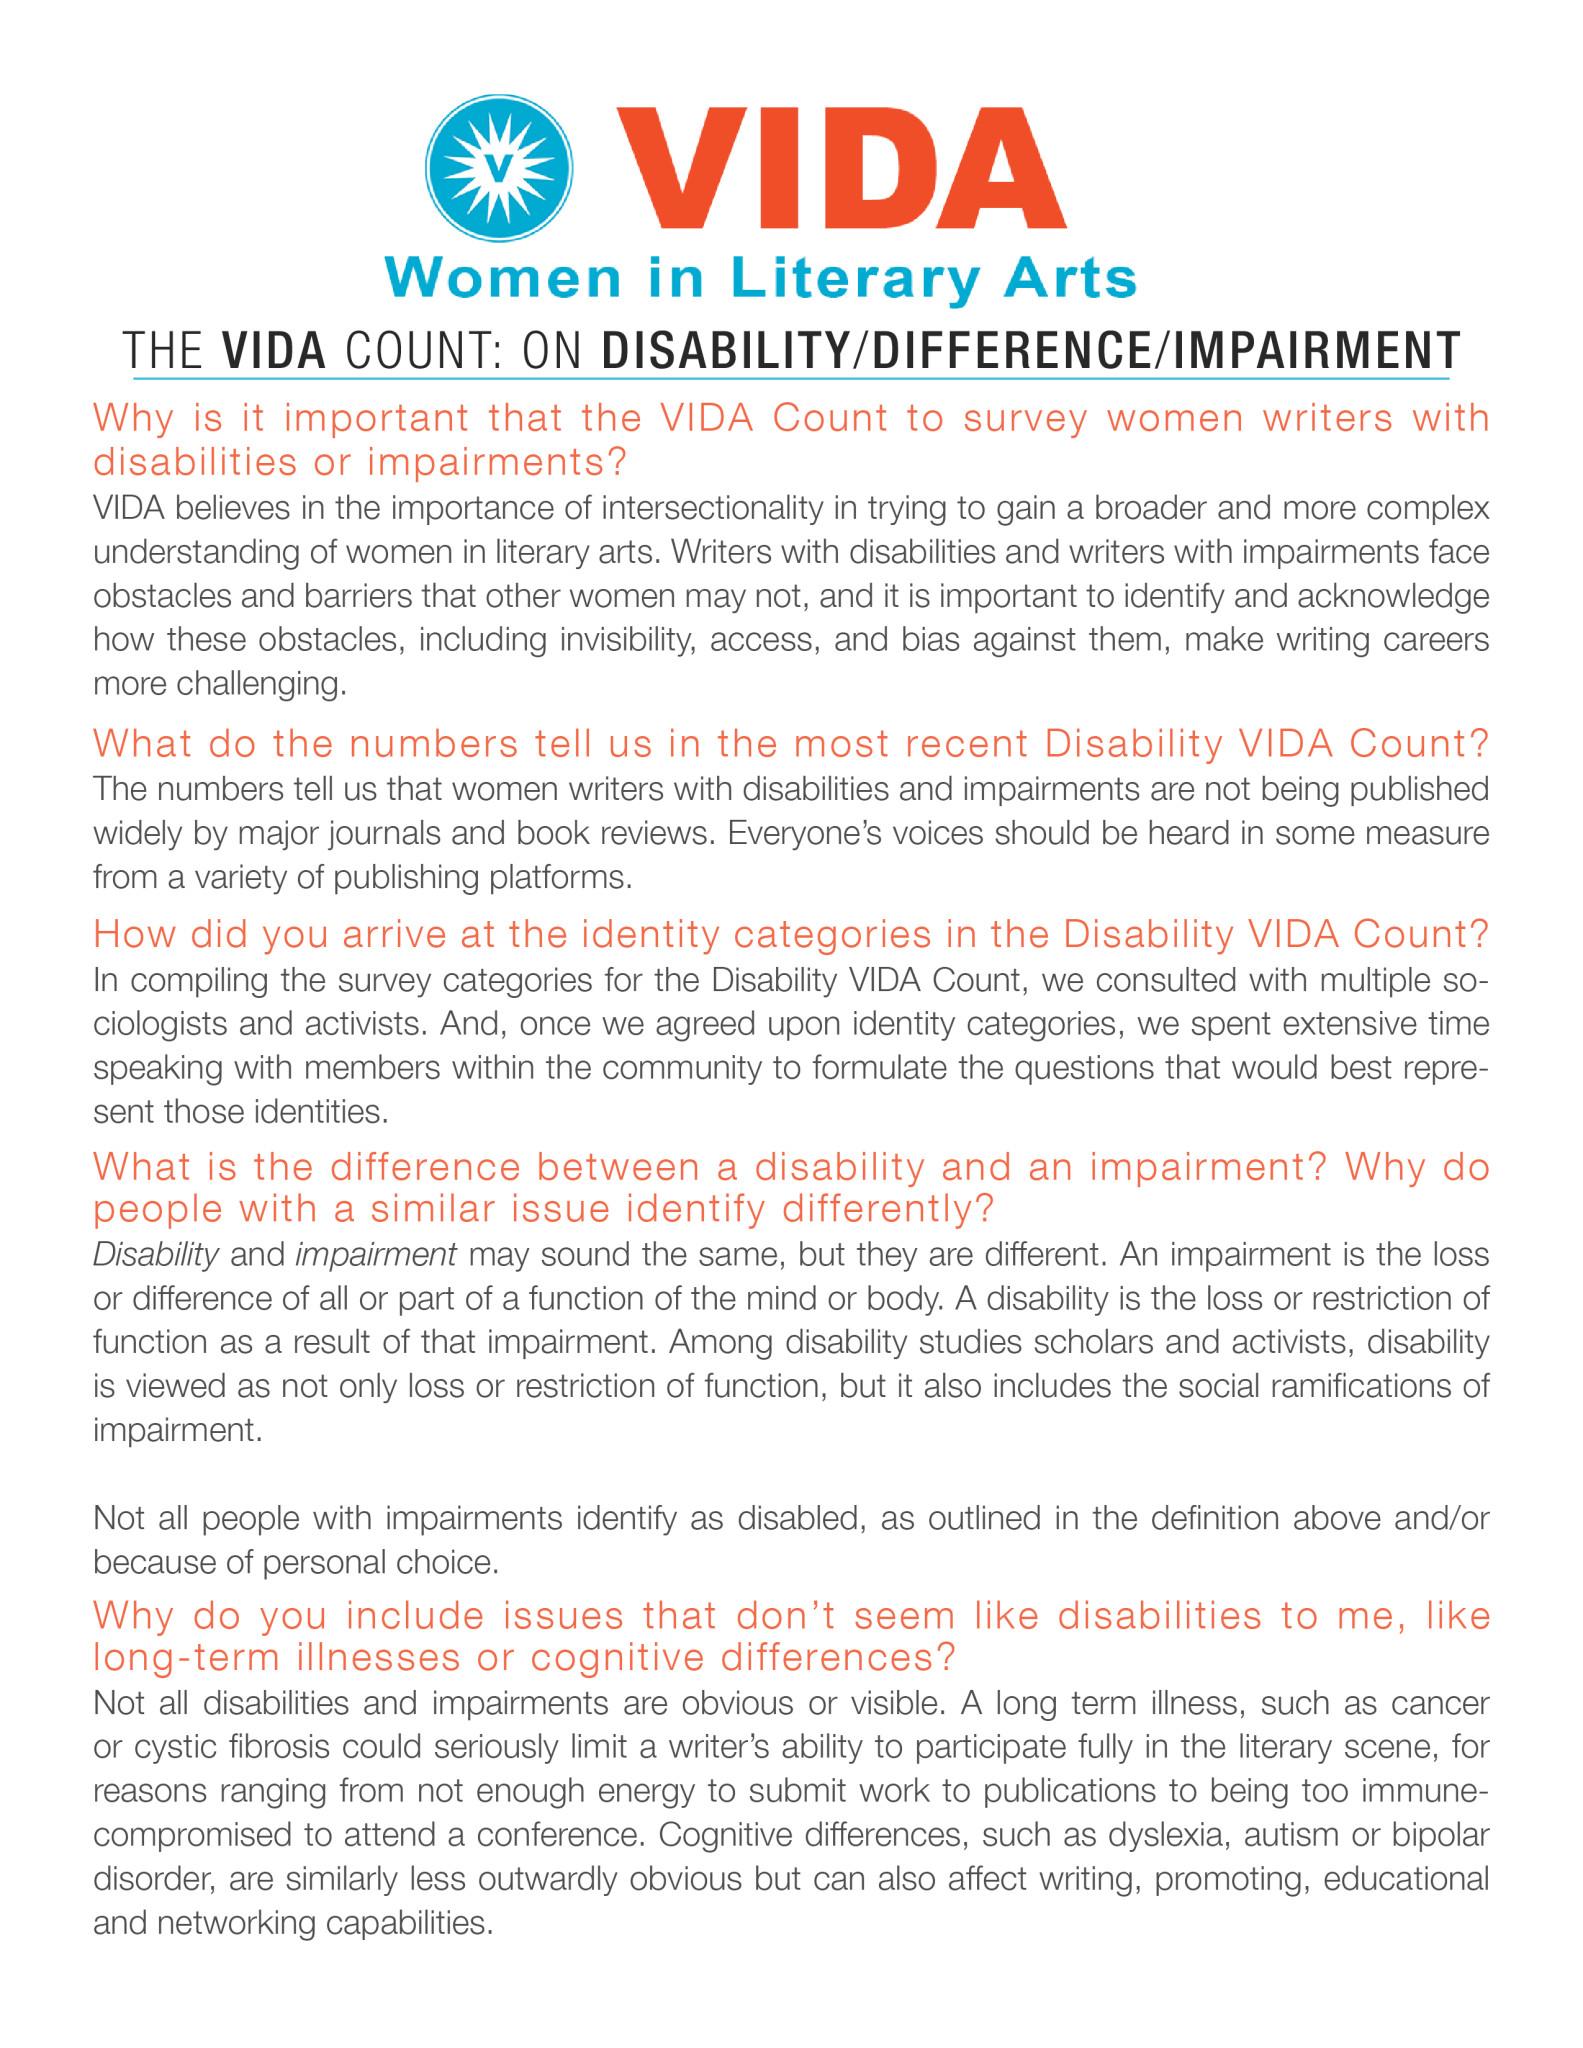 VIDA Disability Primer: page 1